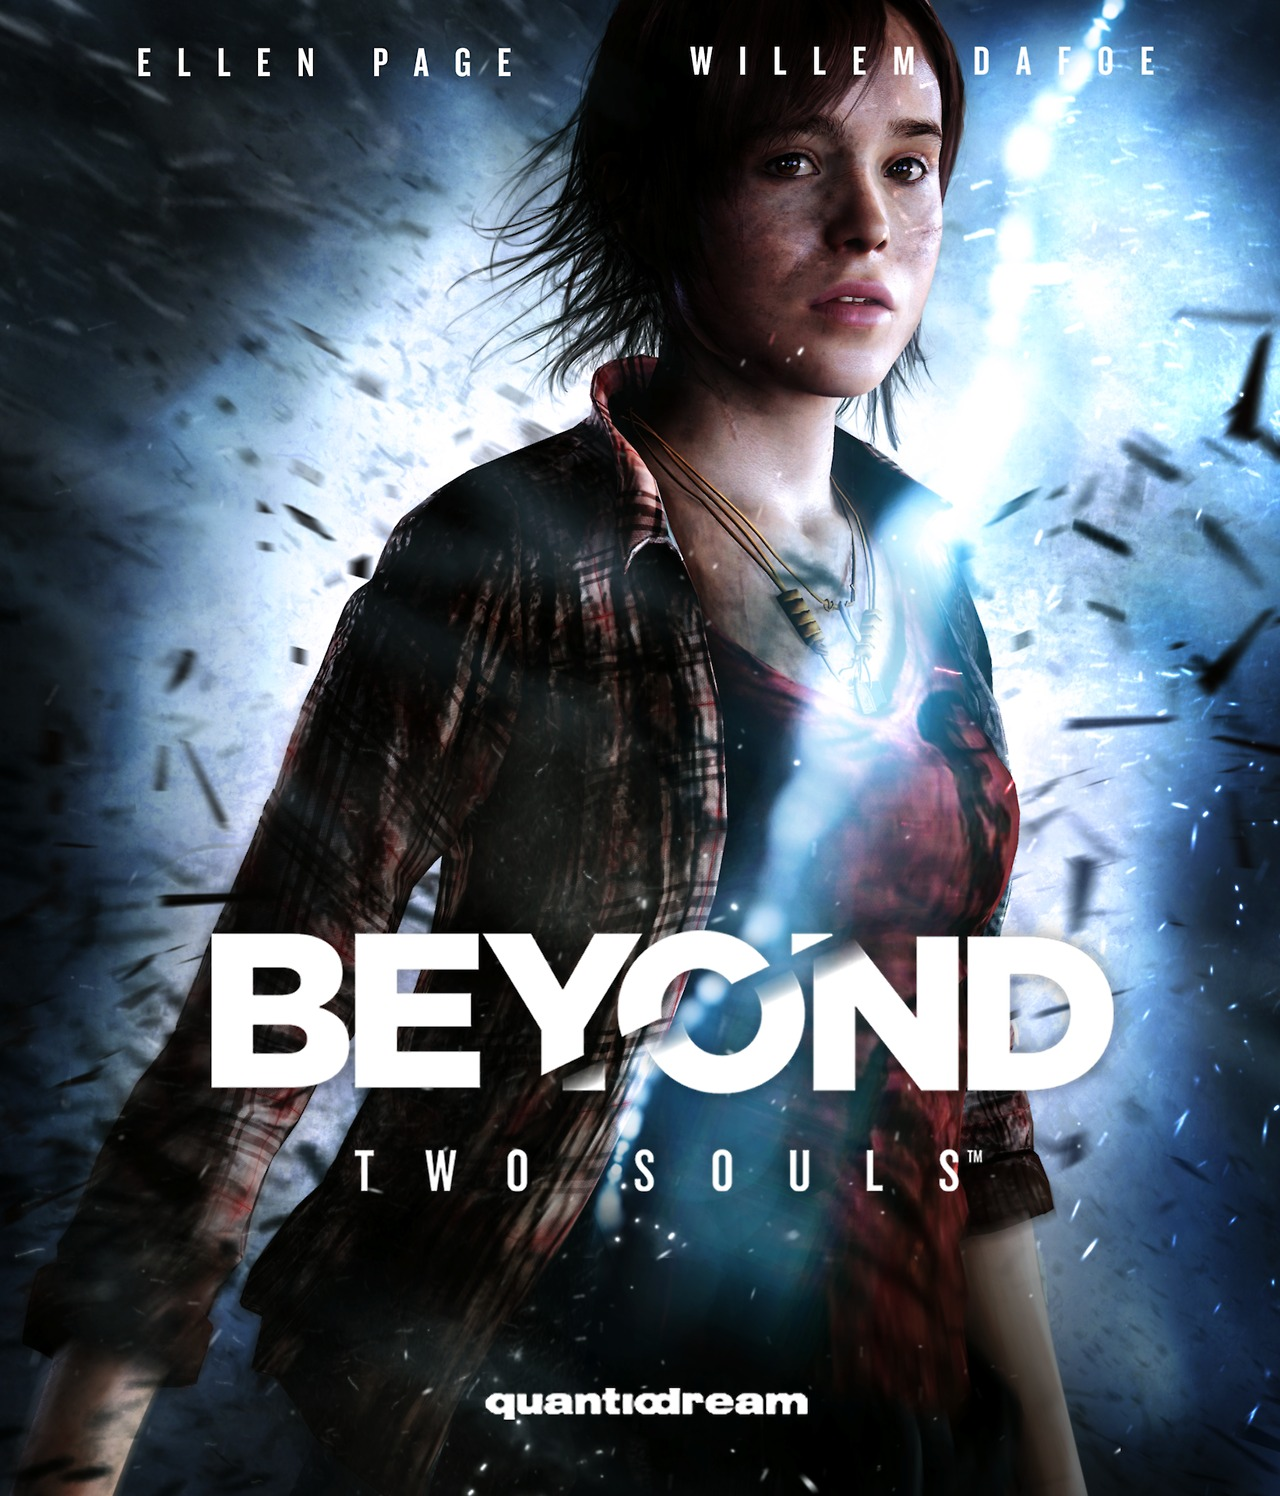 Beyond: Two Souls (2013) (Videogame)